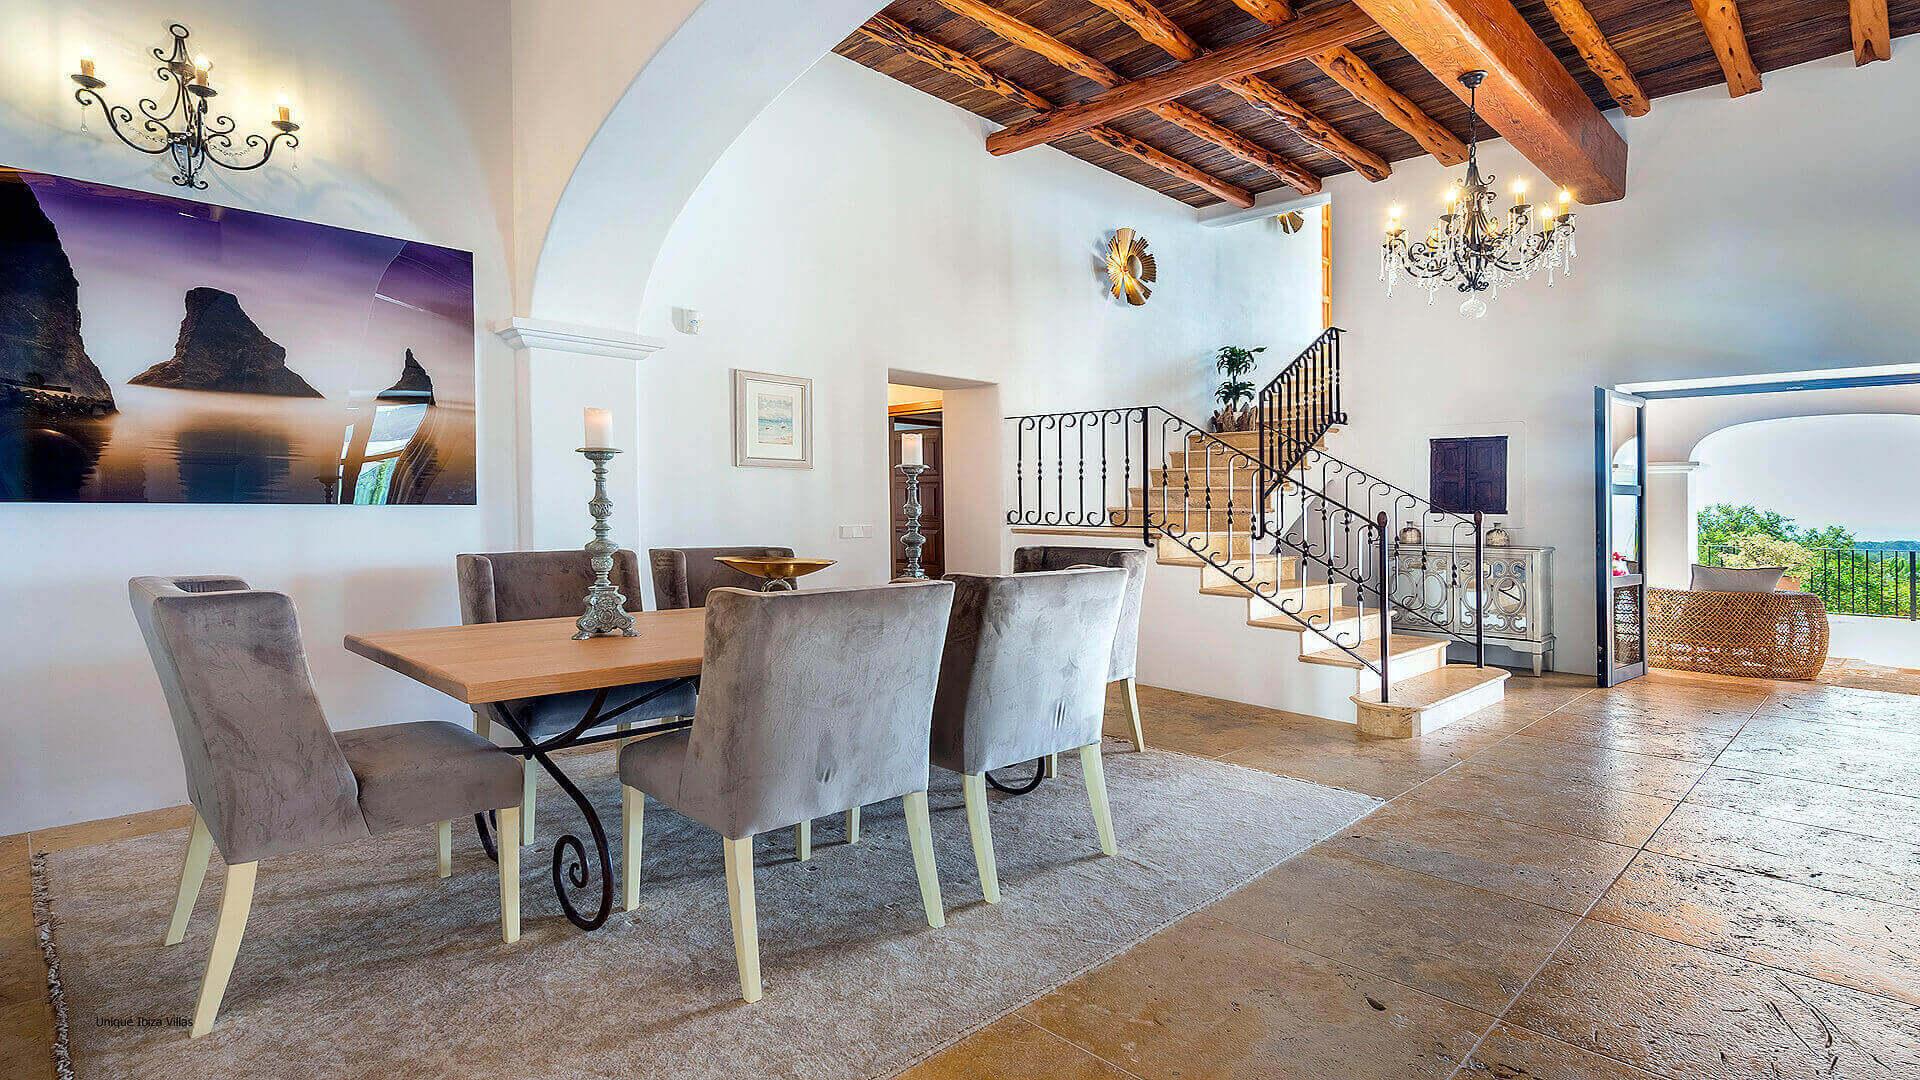 Casa Prats Ibiza 29 Santa Eulalia